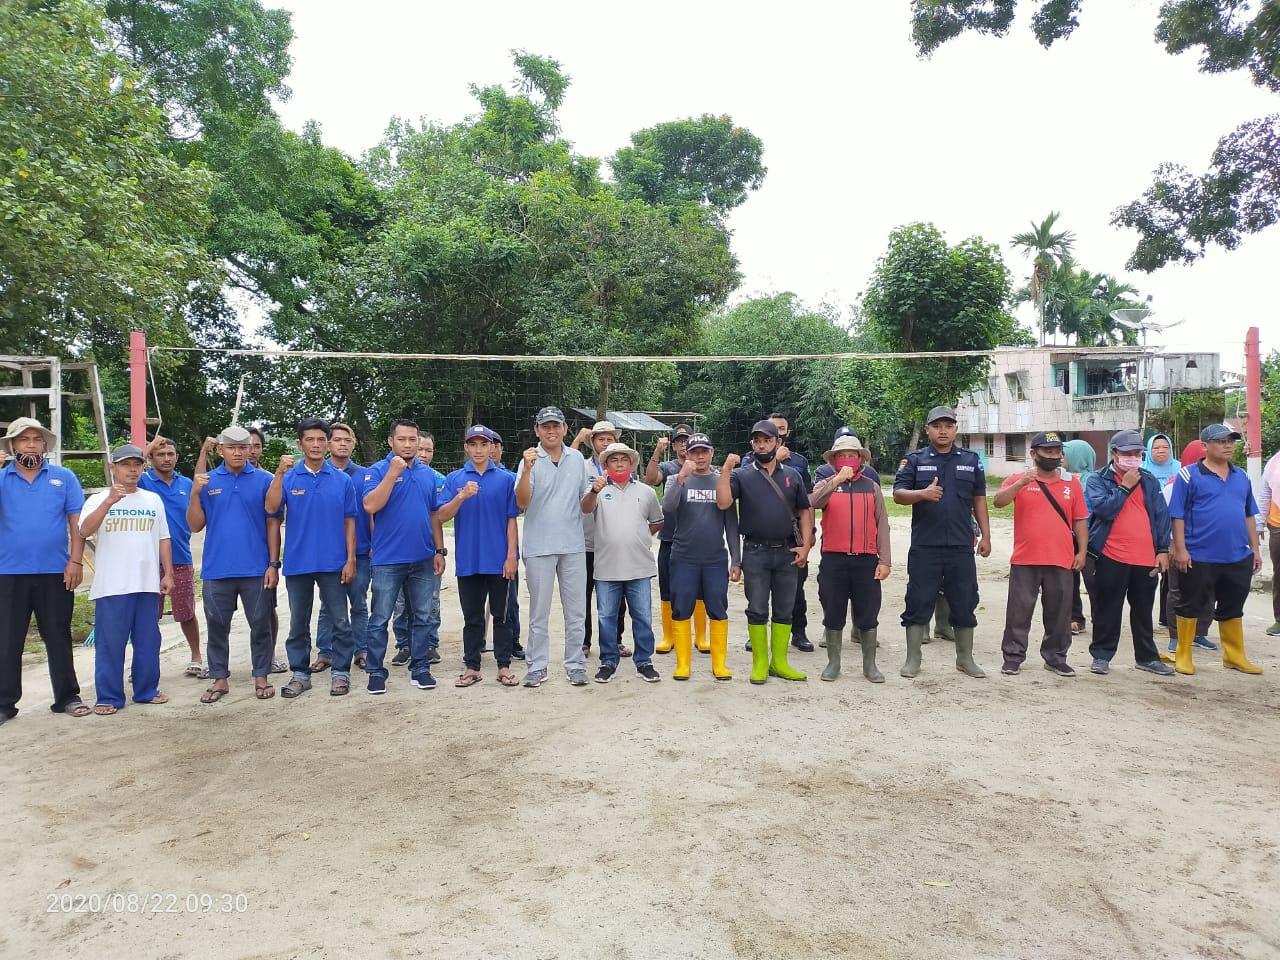 PTPN 4 Unit Kebun Laras Gotroy Bersama Masyarakat Di Objek Wisata Karang Anyar Simalungun